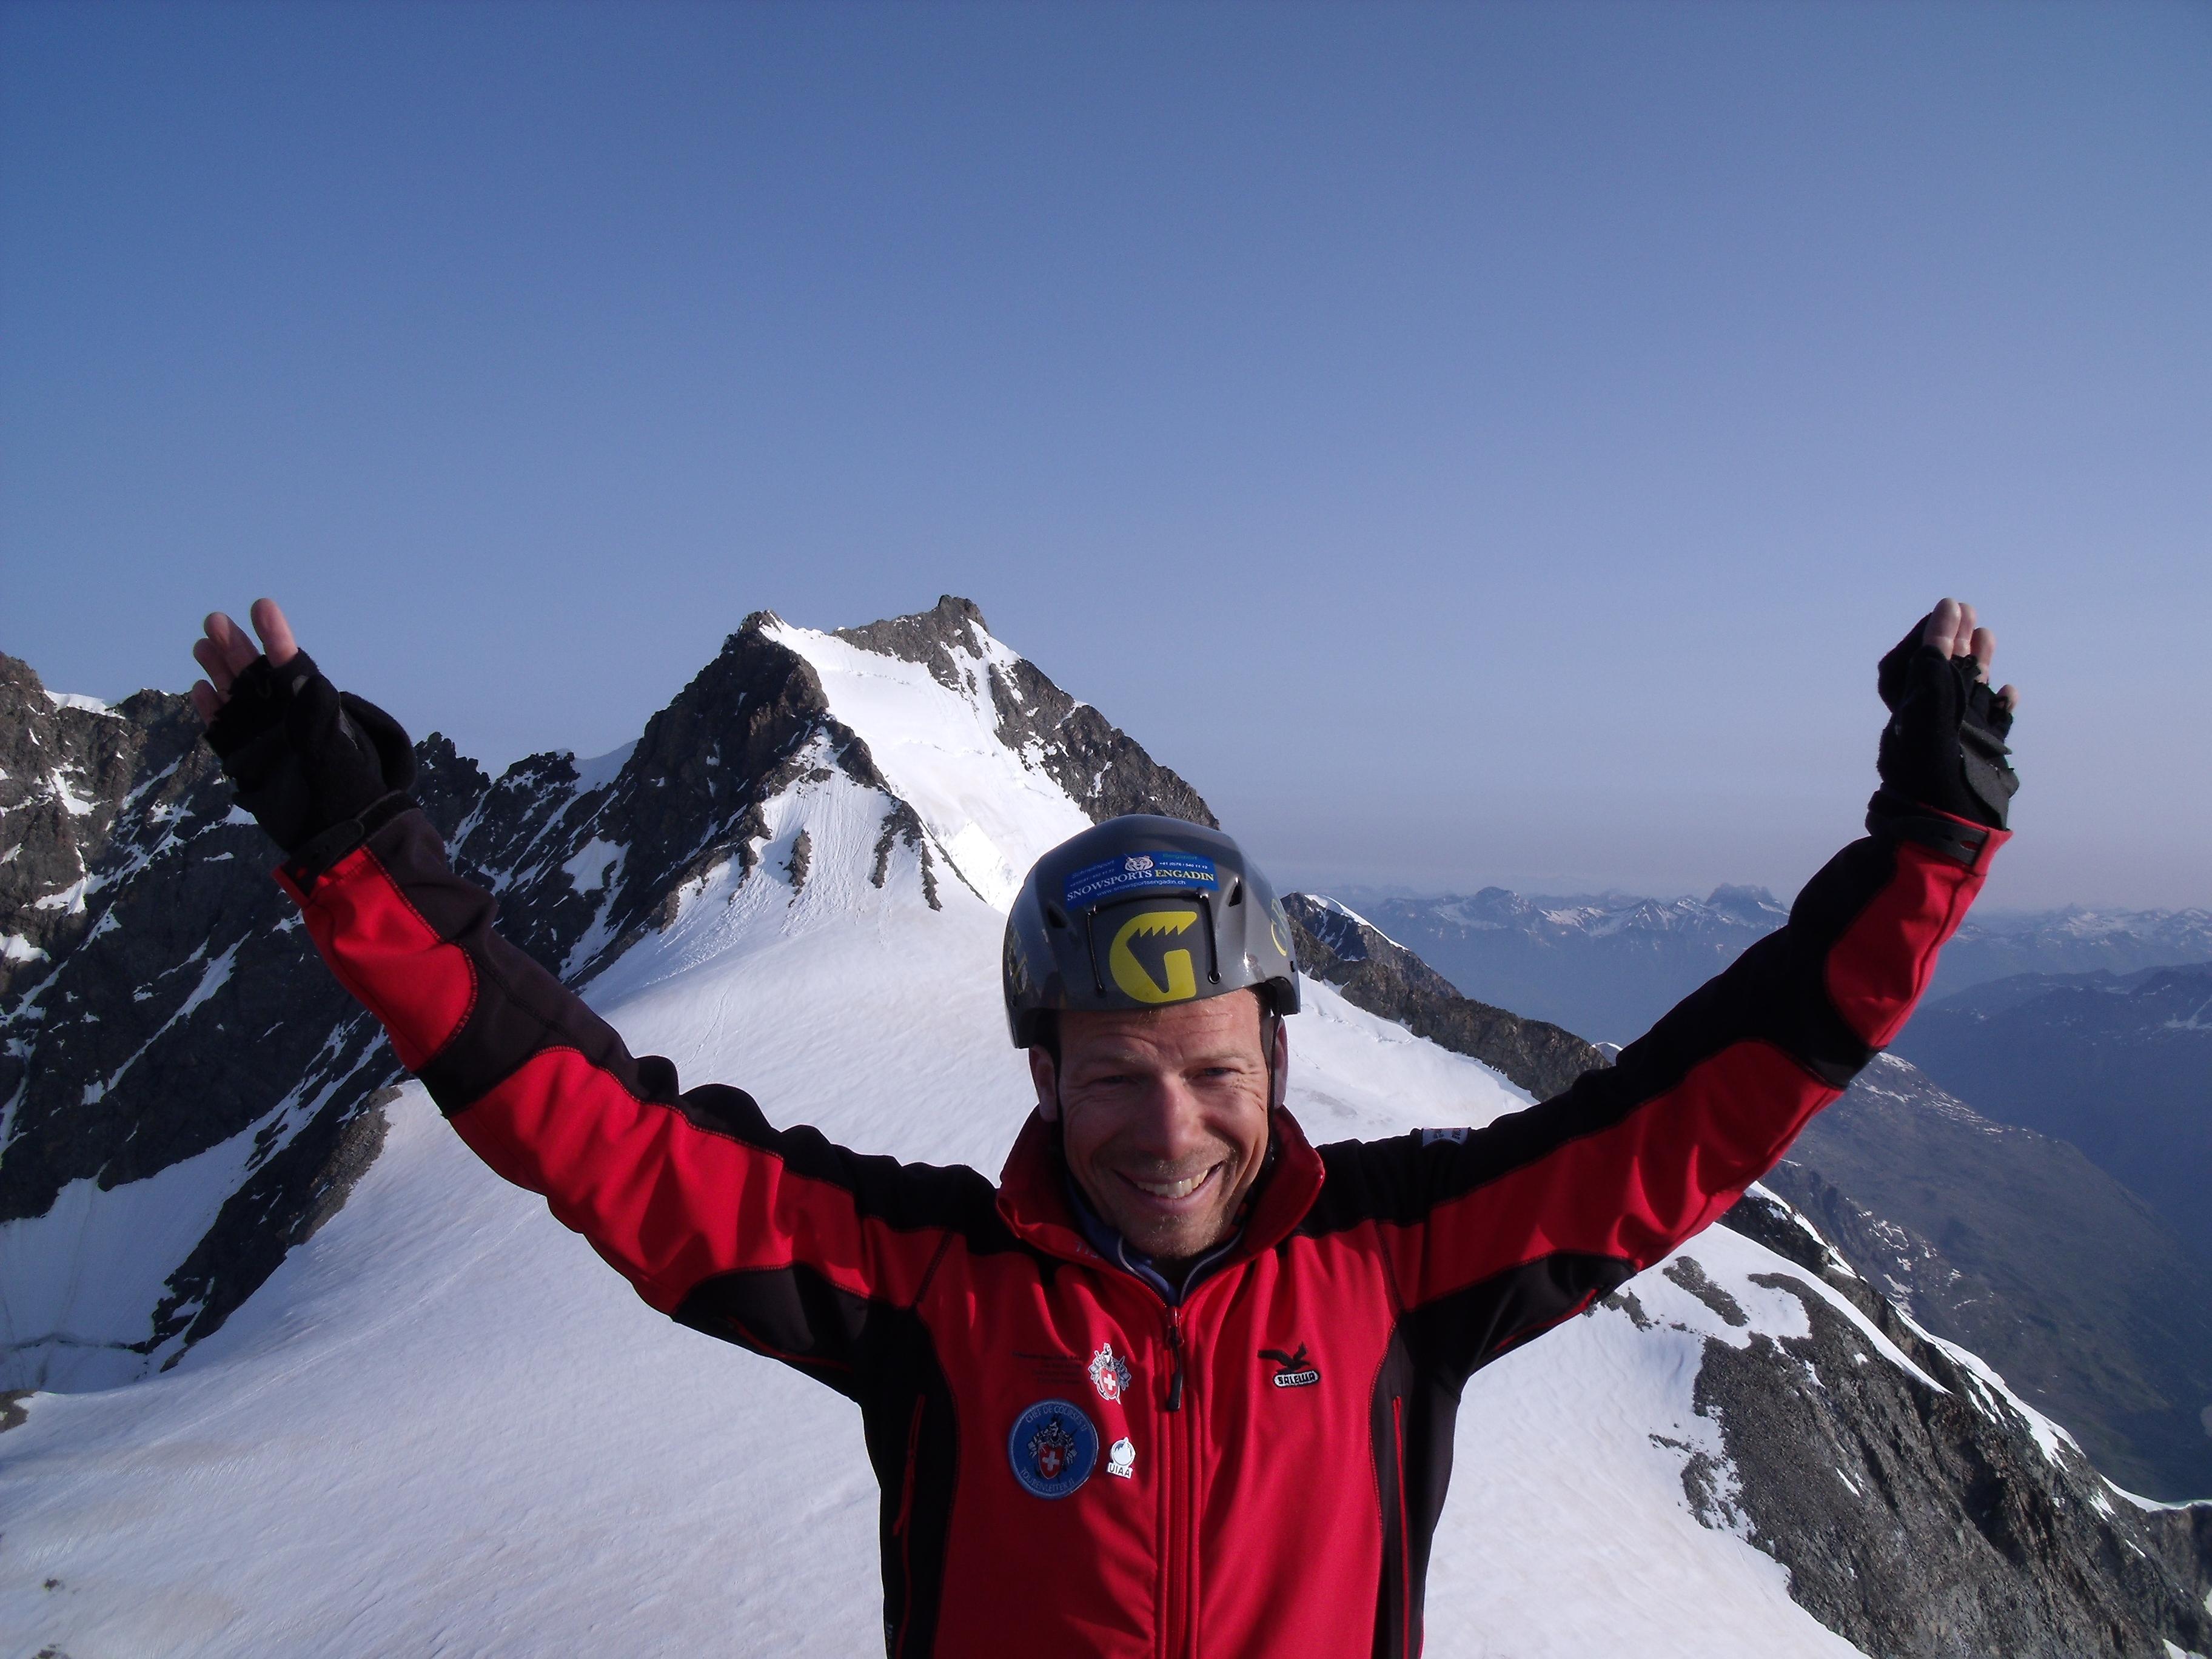 Skischule Bär Snowsports Engadin Slide 4